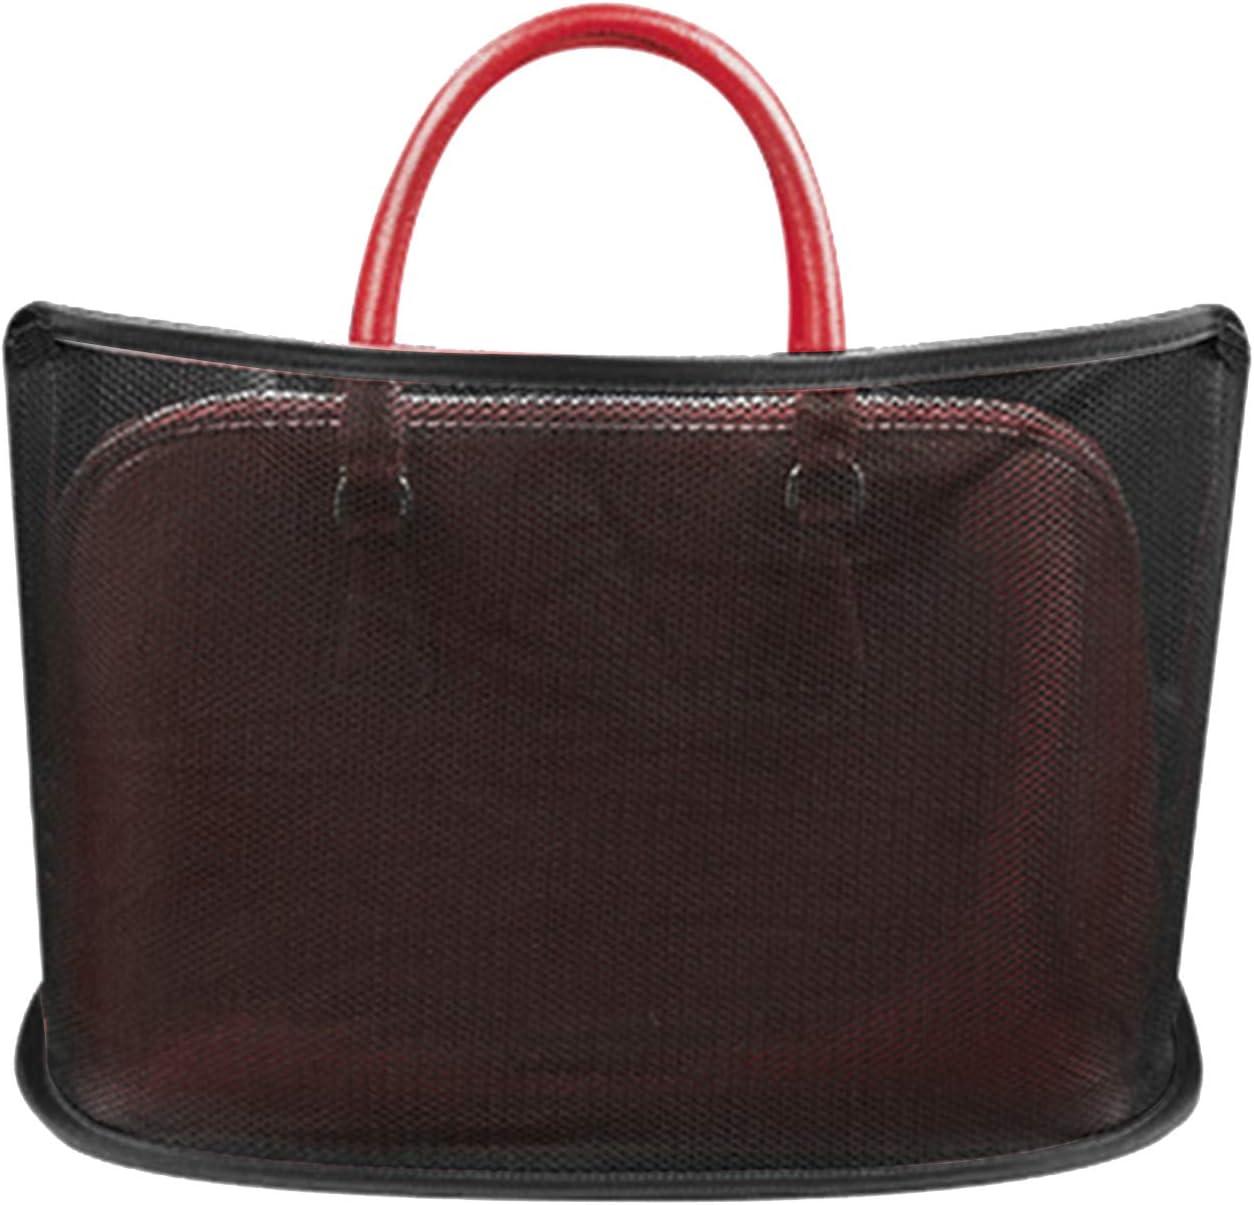 Not Included Handbag Black, Advanced Car Net Pocket Handbag Holder Seat Back Organizer Mesh Large Capacity Bag for Purse Storage Phone Documents Pocket Car Seat Storage Net Bag